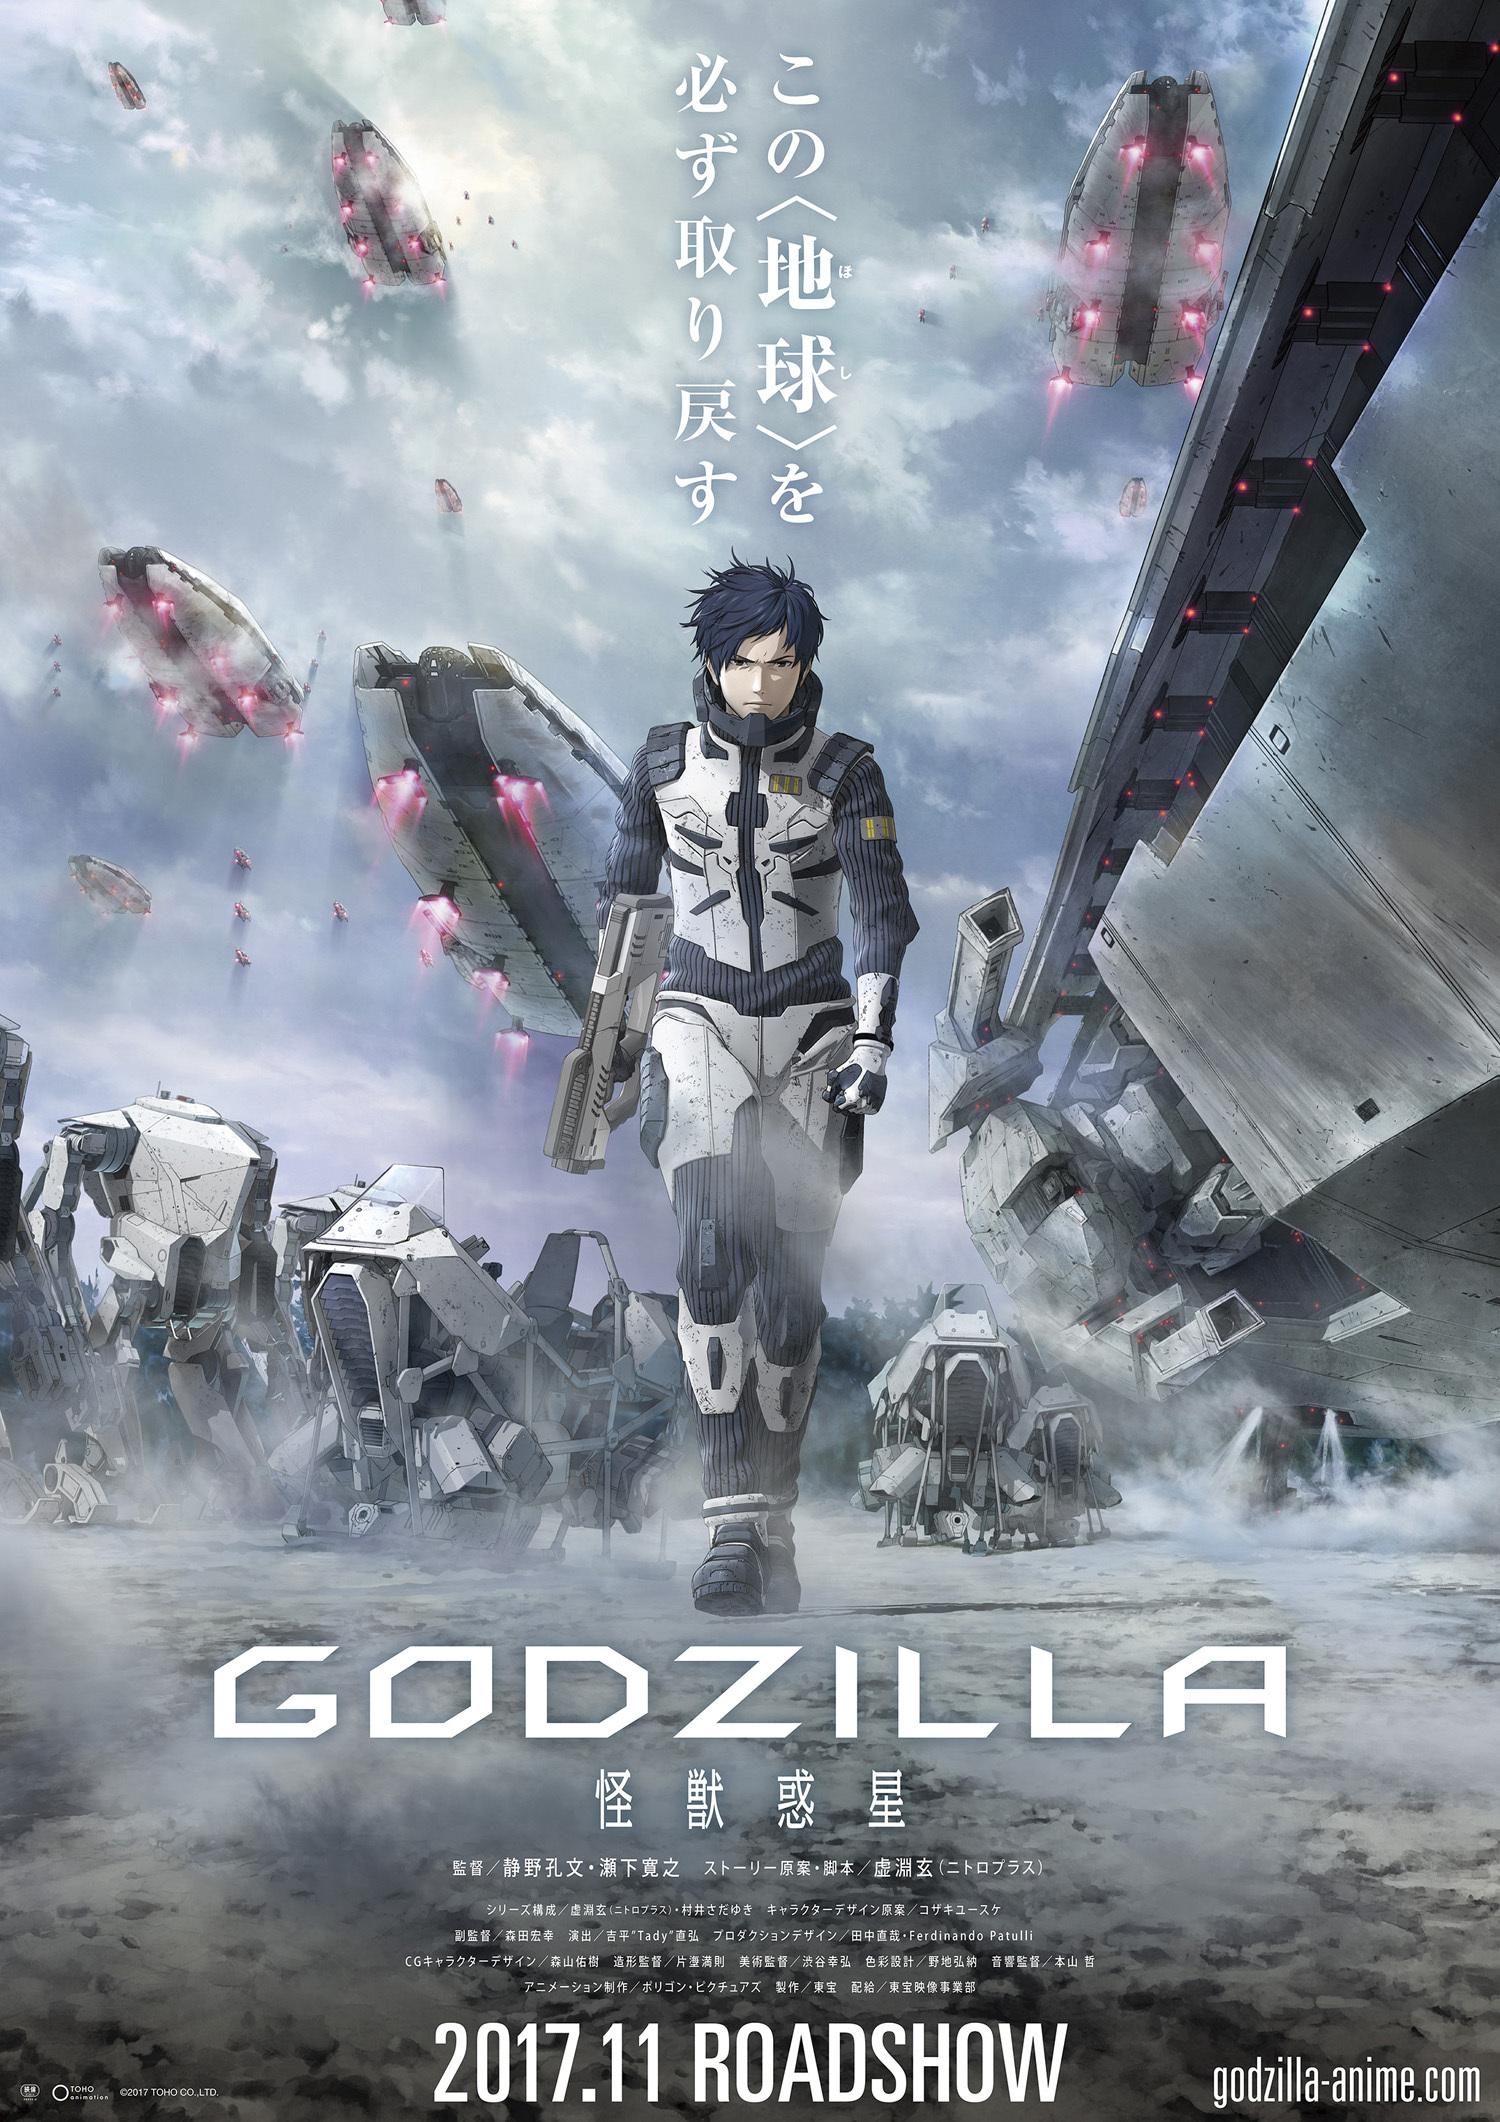 GODZILLA (アニメ映画)の画像 p1_5